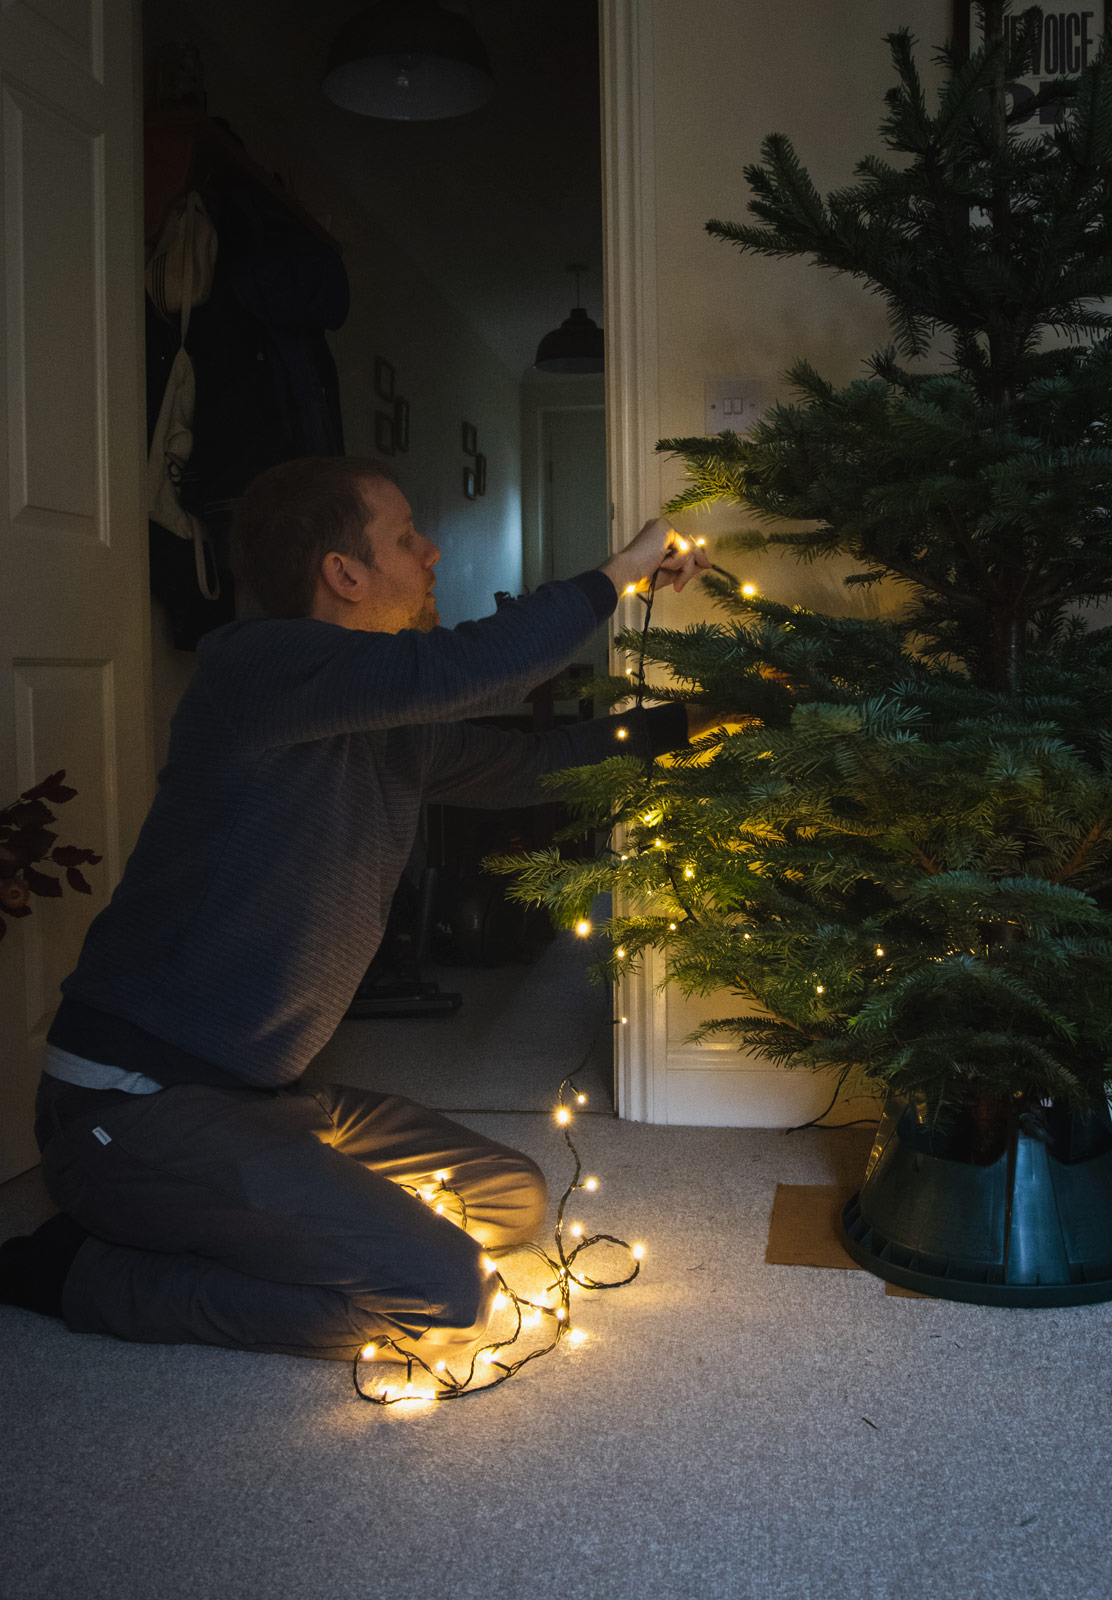 Man putting lights on tree